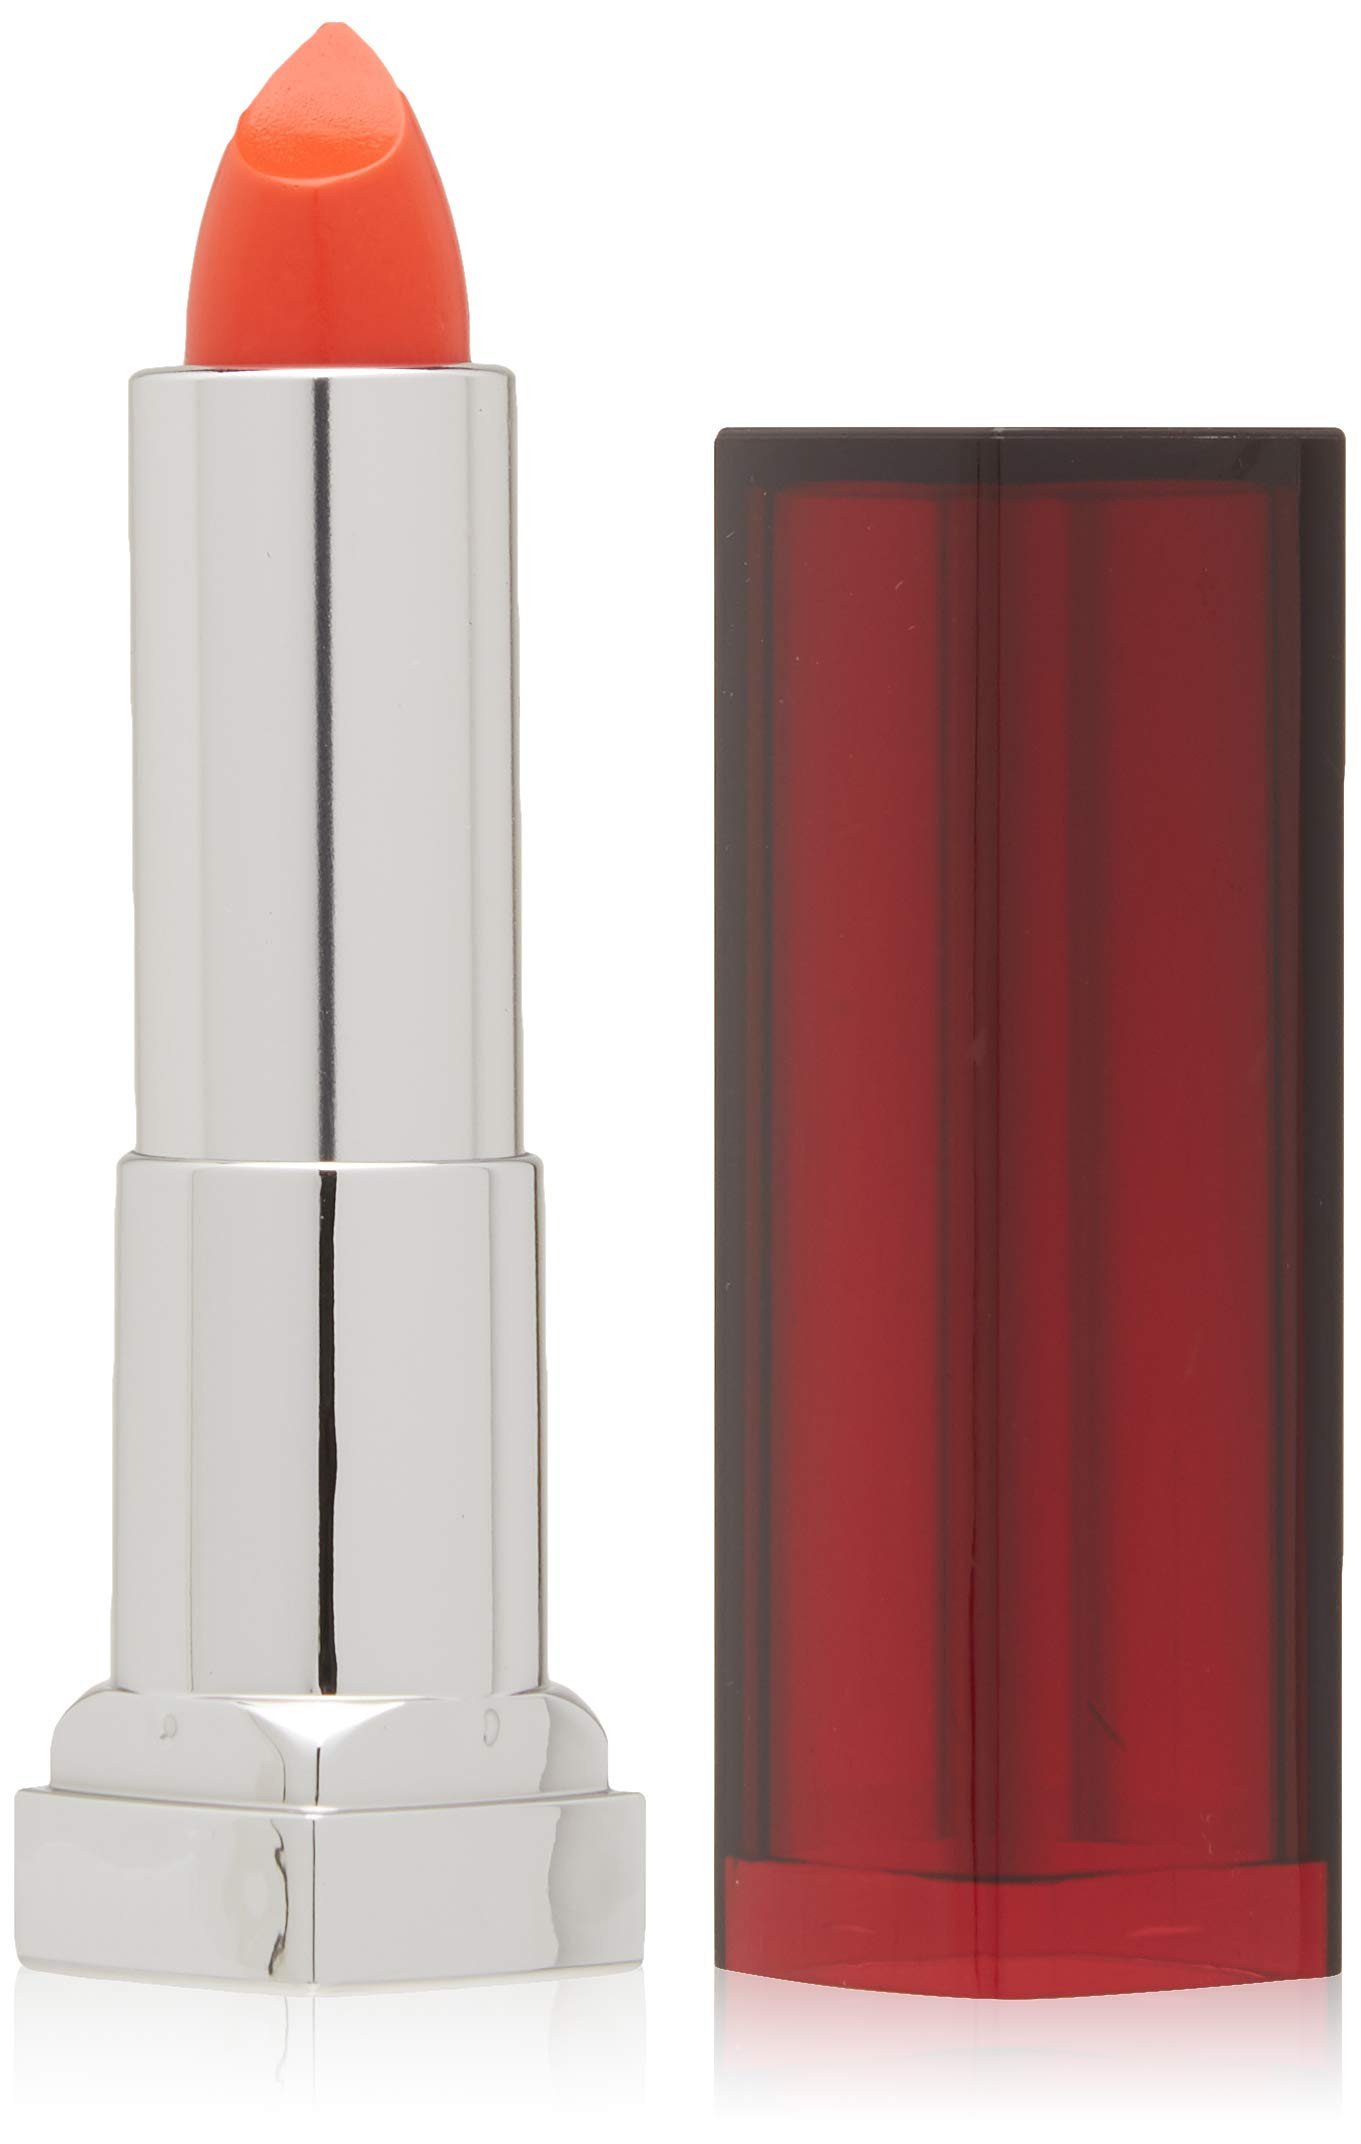 Maybelline New York Color Sensational Orange Lipstick, Satin Lipstick, Electric Orange, 0.15 oz,Pack of 1